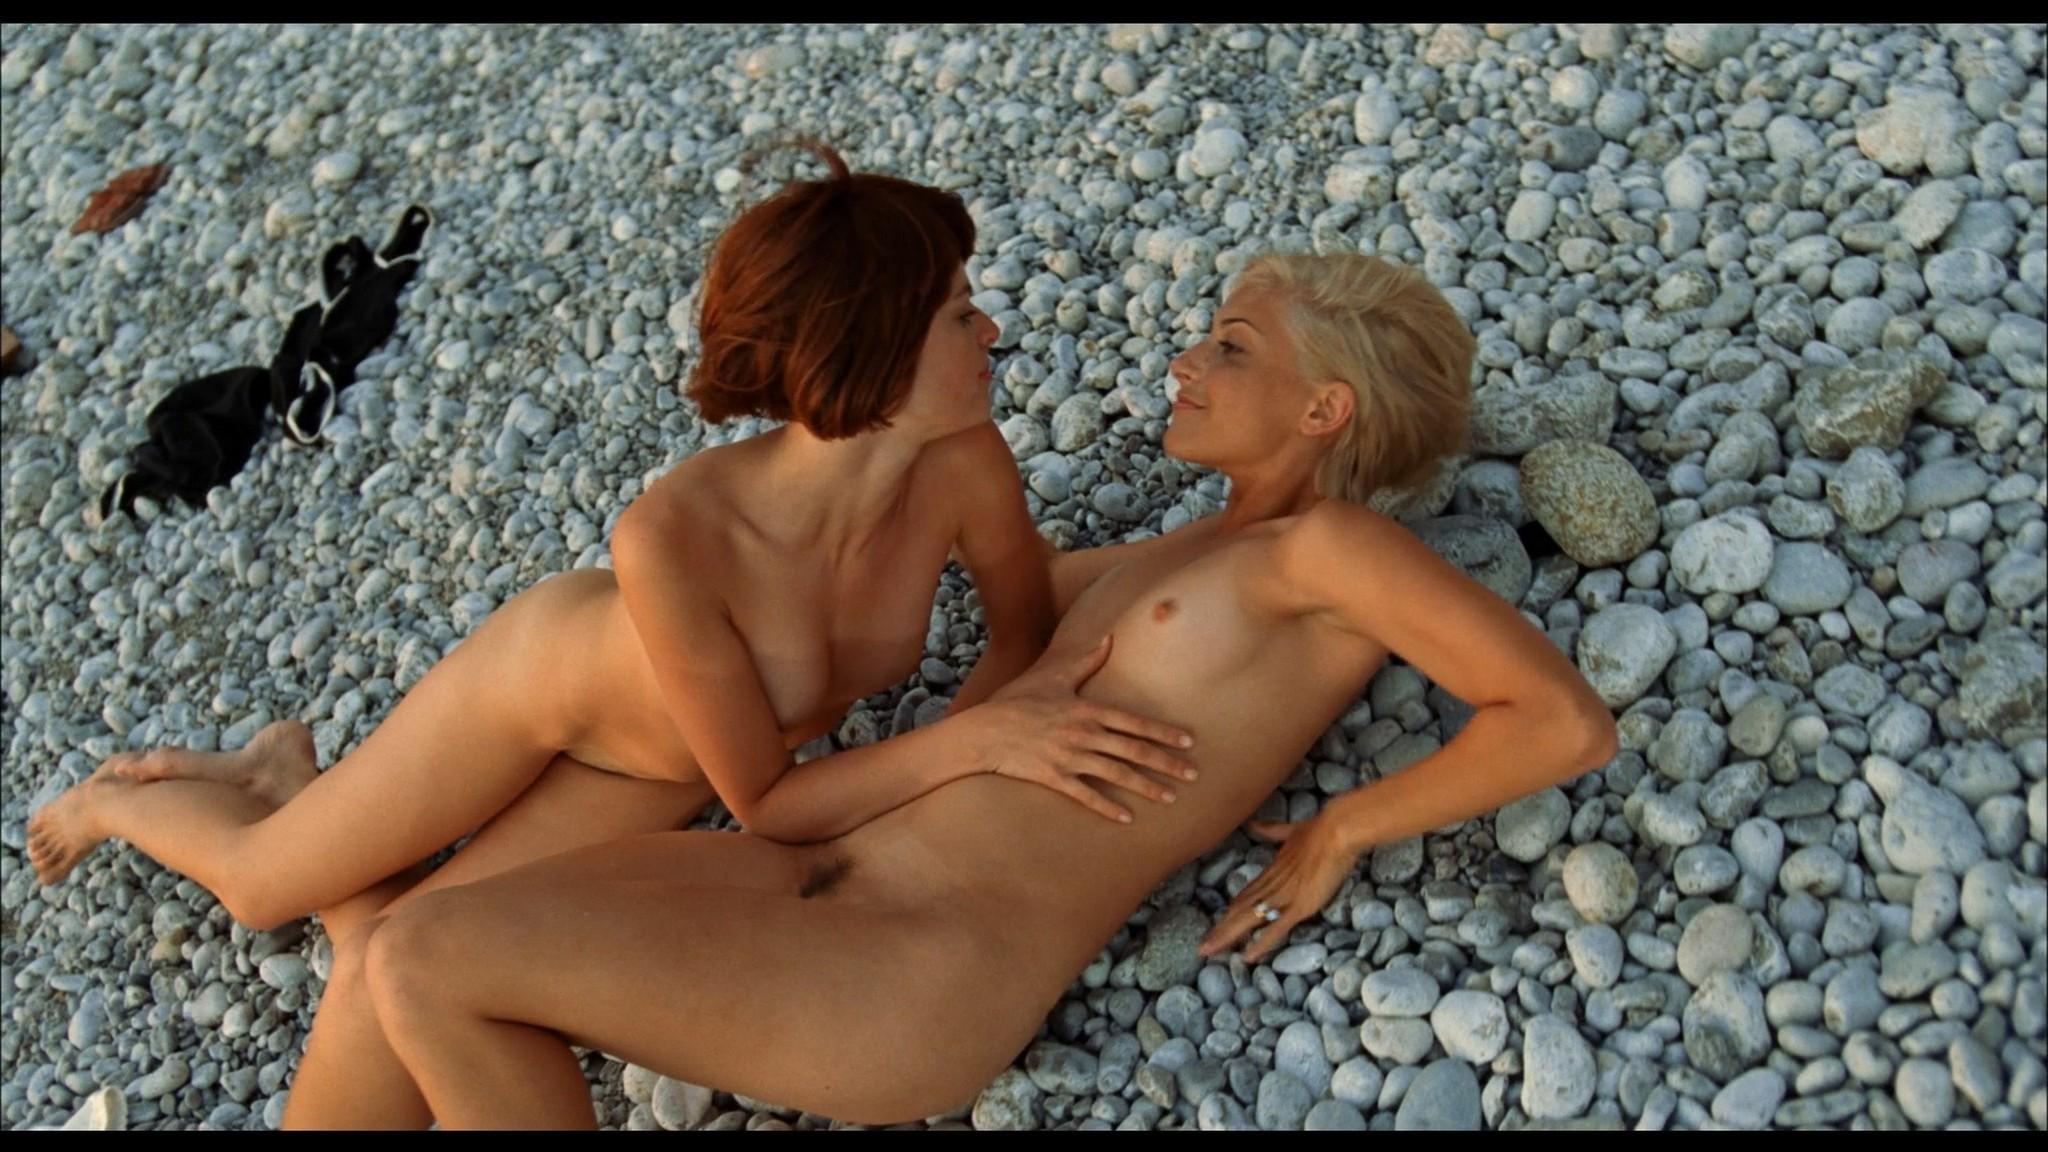 Avalon Barrie nude and Lyudmila Shiryaeva nude full frontal Sappho 2008 HD 1080p BluRay REMUX 20